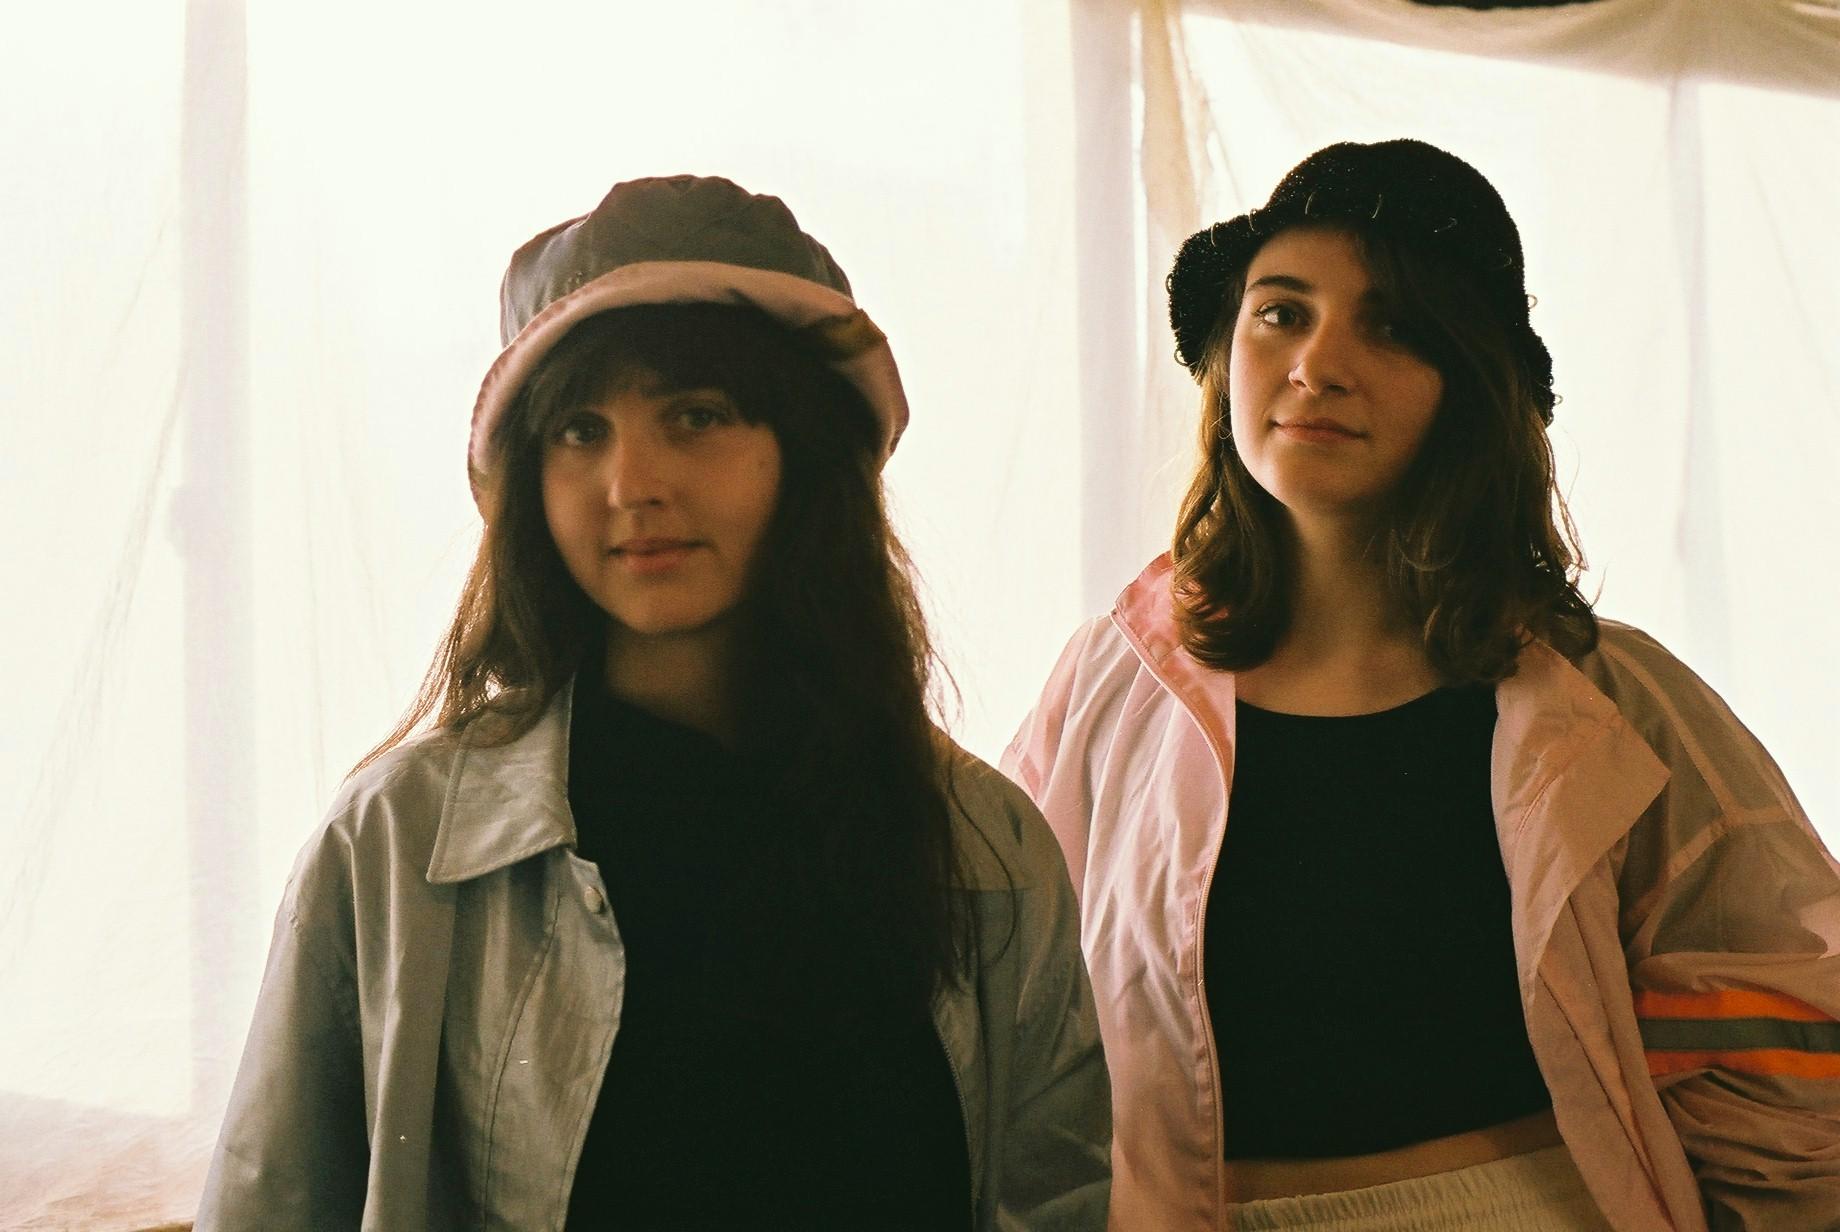 (Photo by 左:エラ 、右:ドロシー)